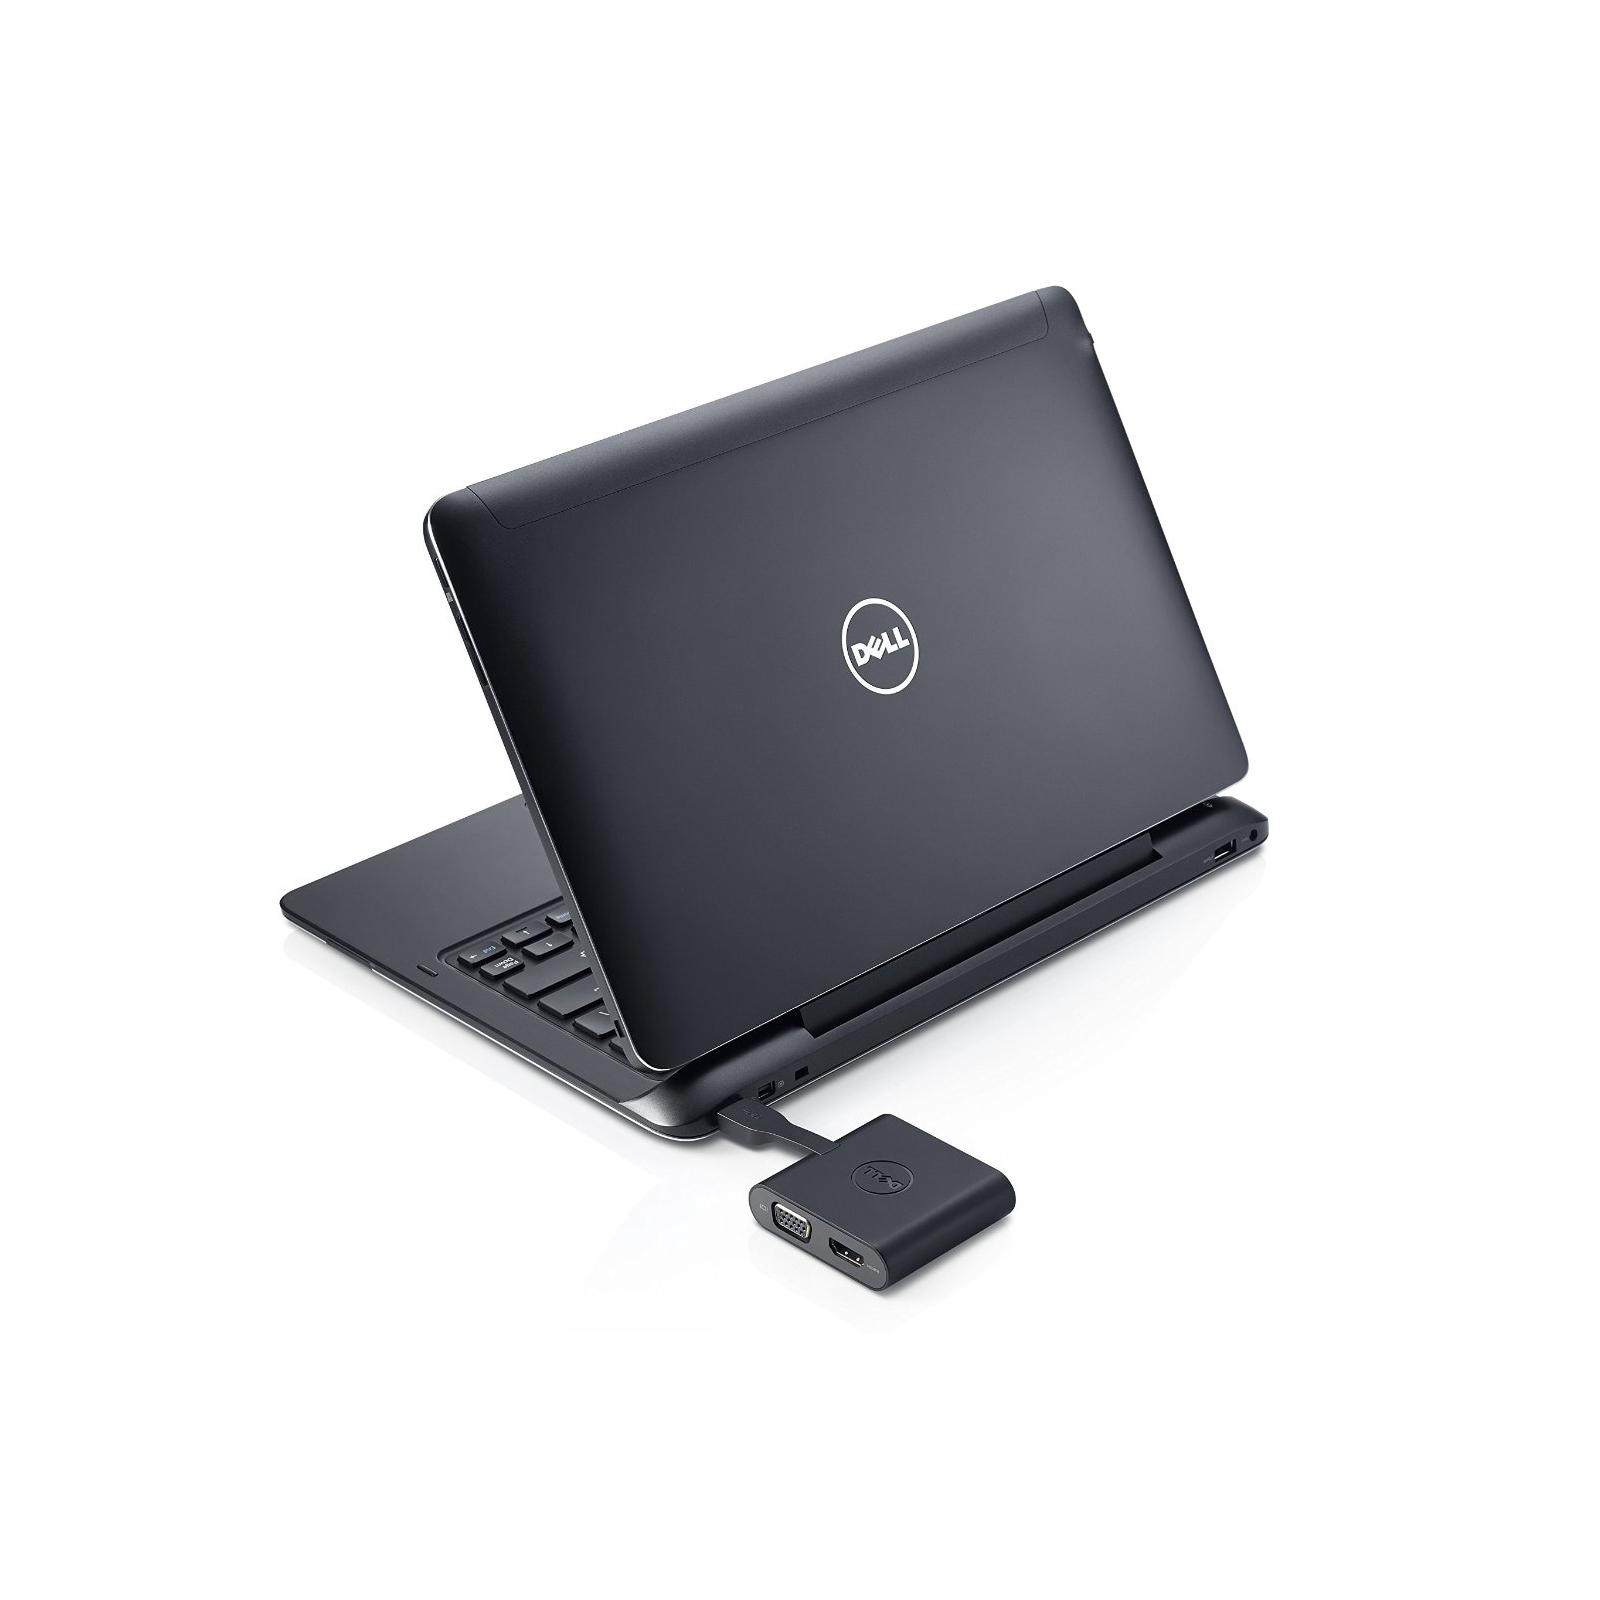 Порт-репликатор Dell DA100 USB 3.0 to HDMI/VGA/Ethernet/USB 2.0 (492-BBNU) изображение 5